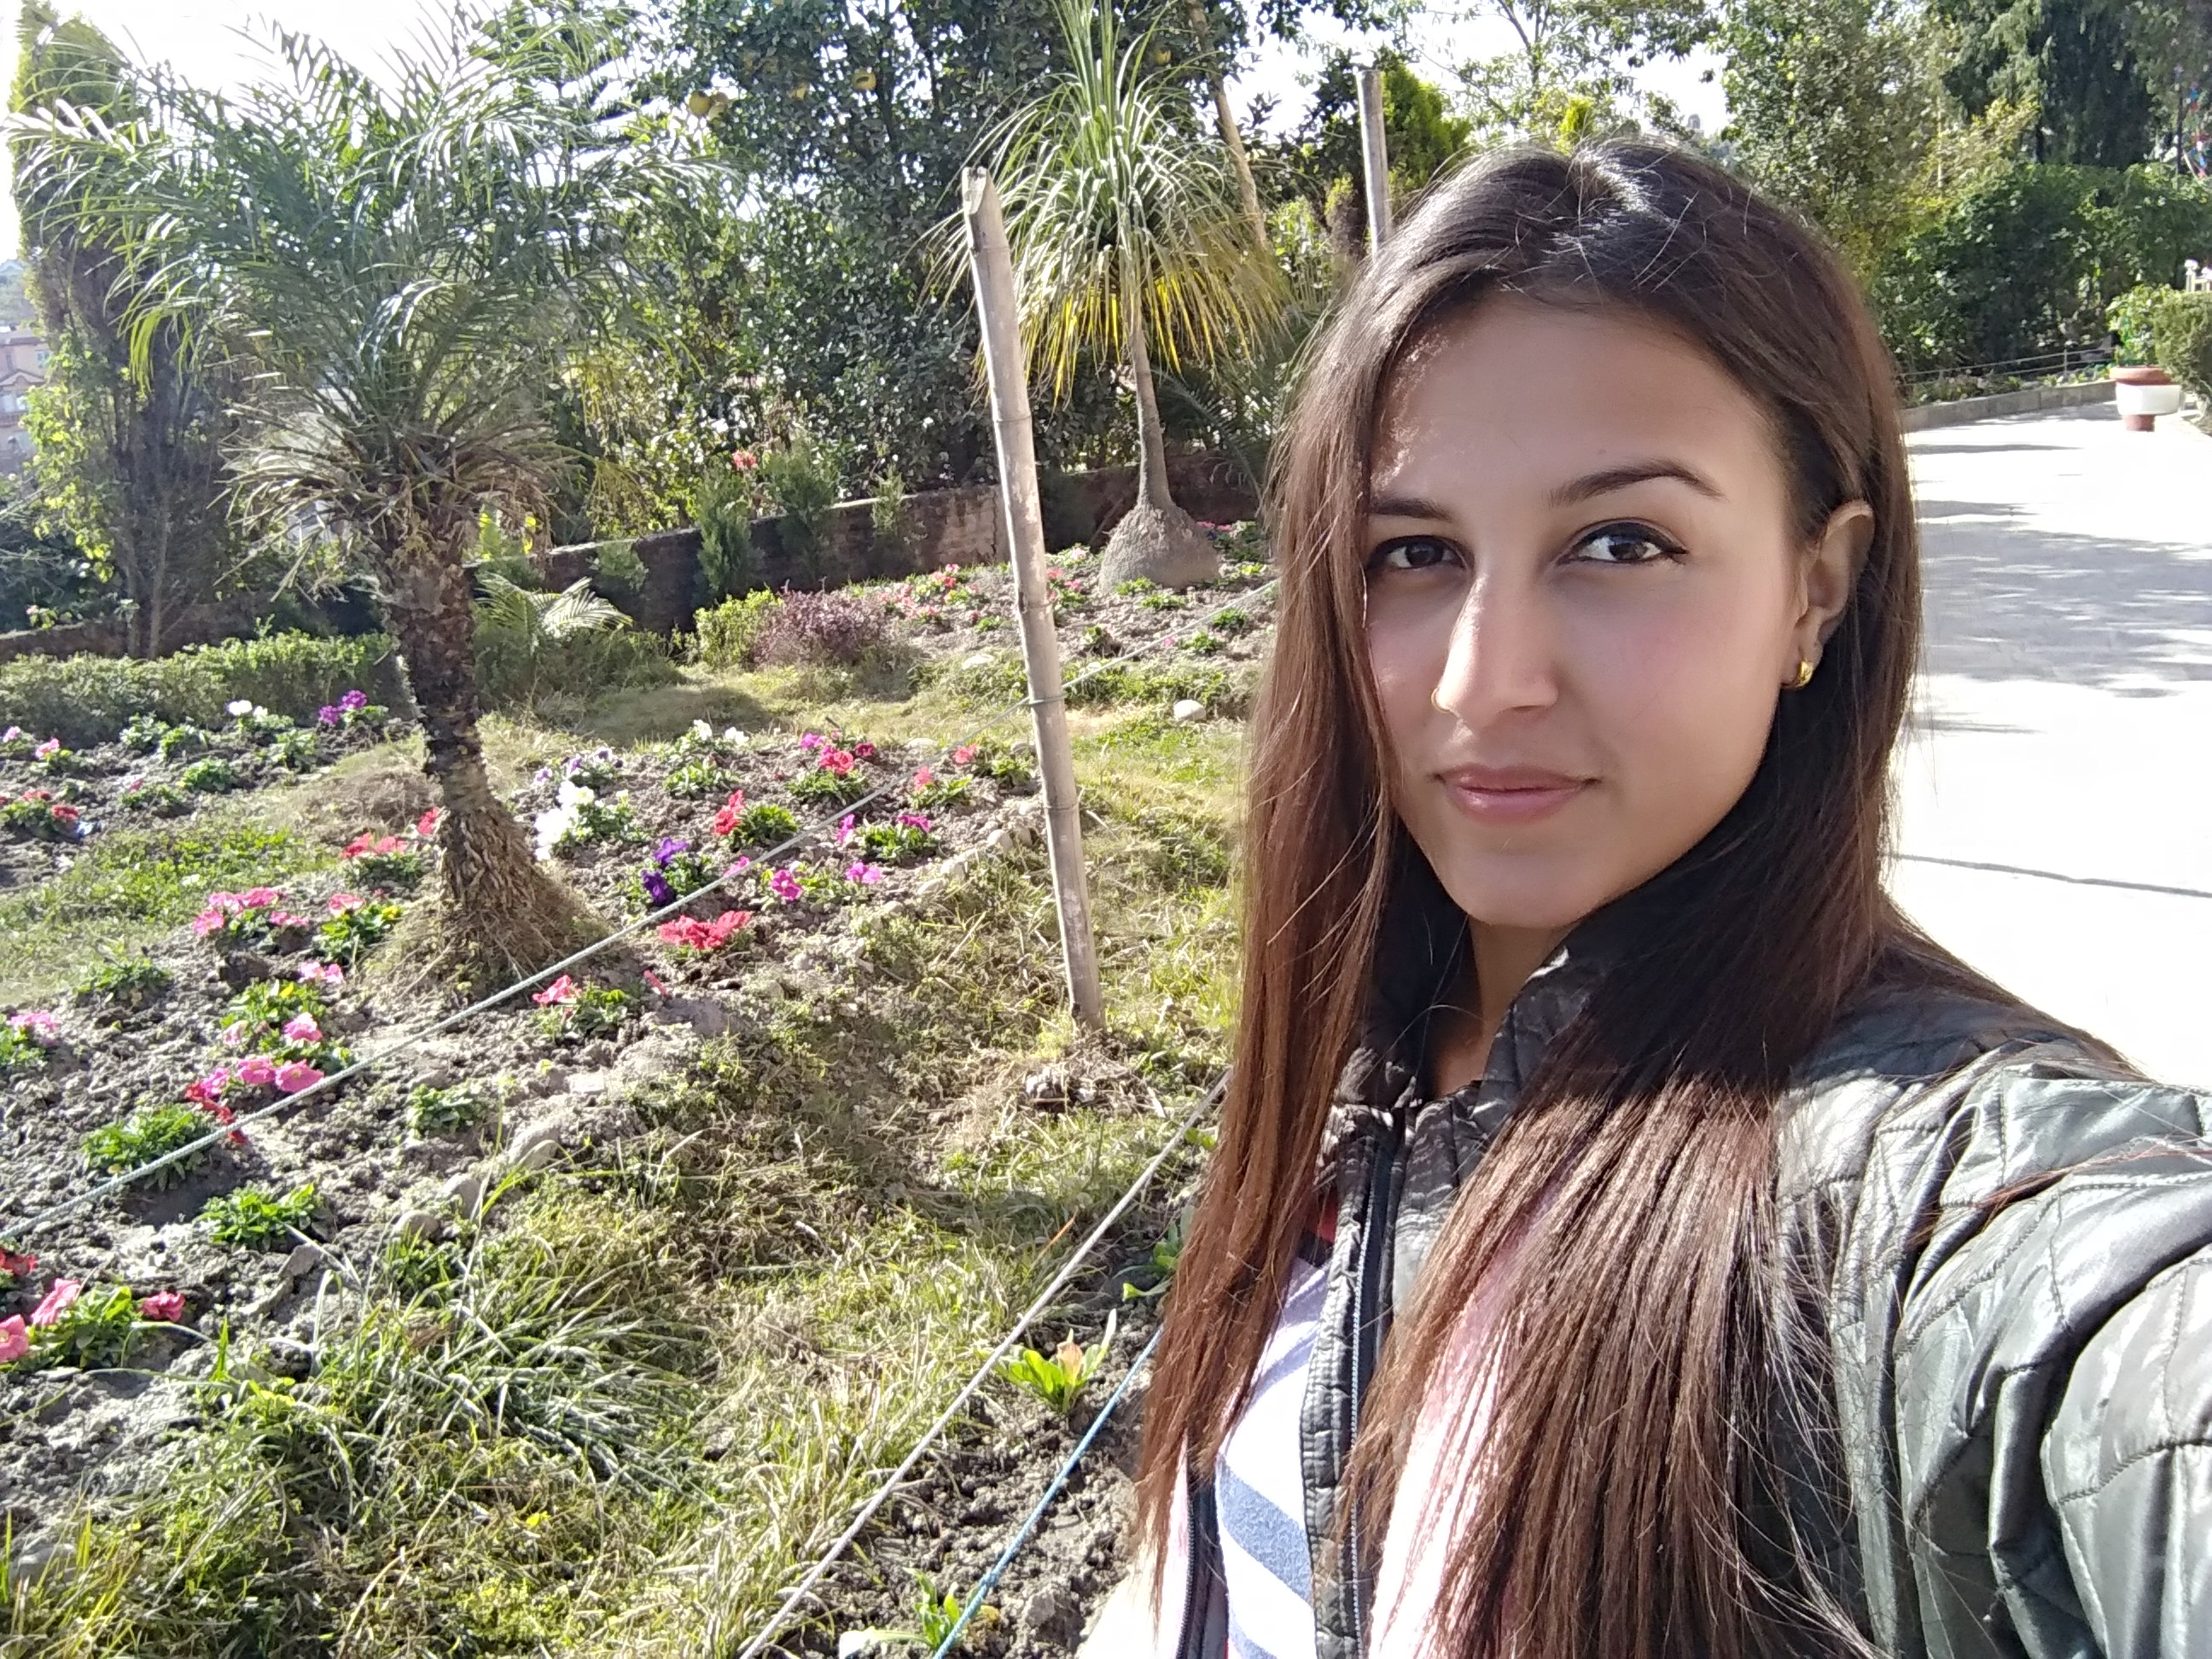 Archana Adhikari